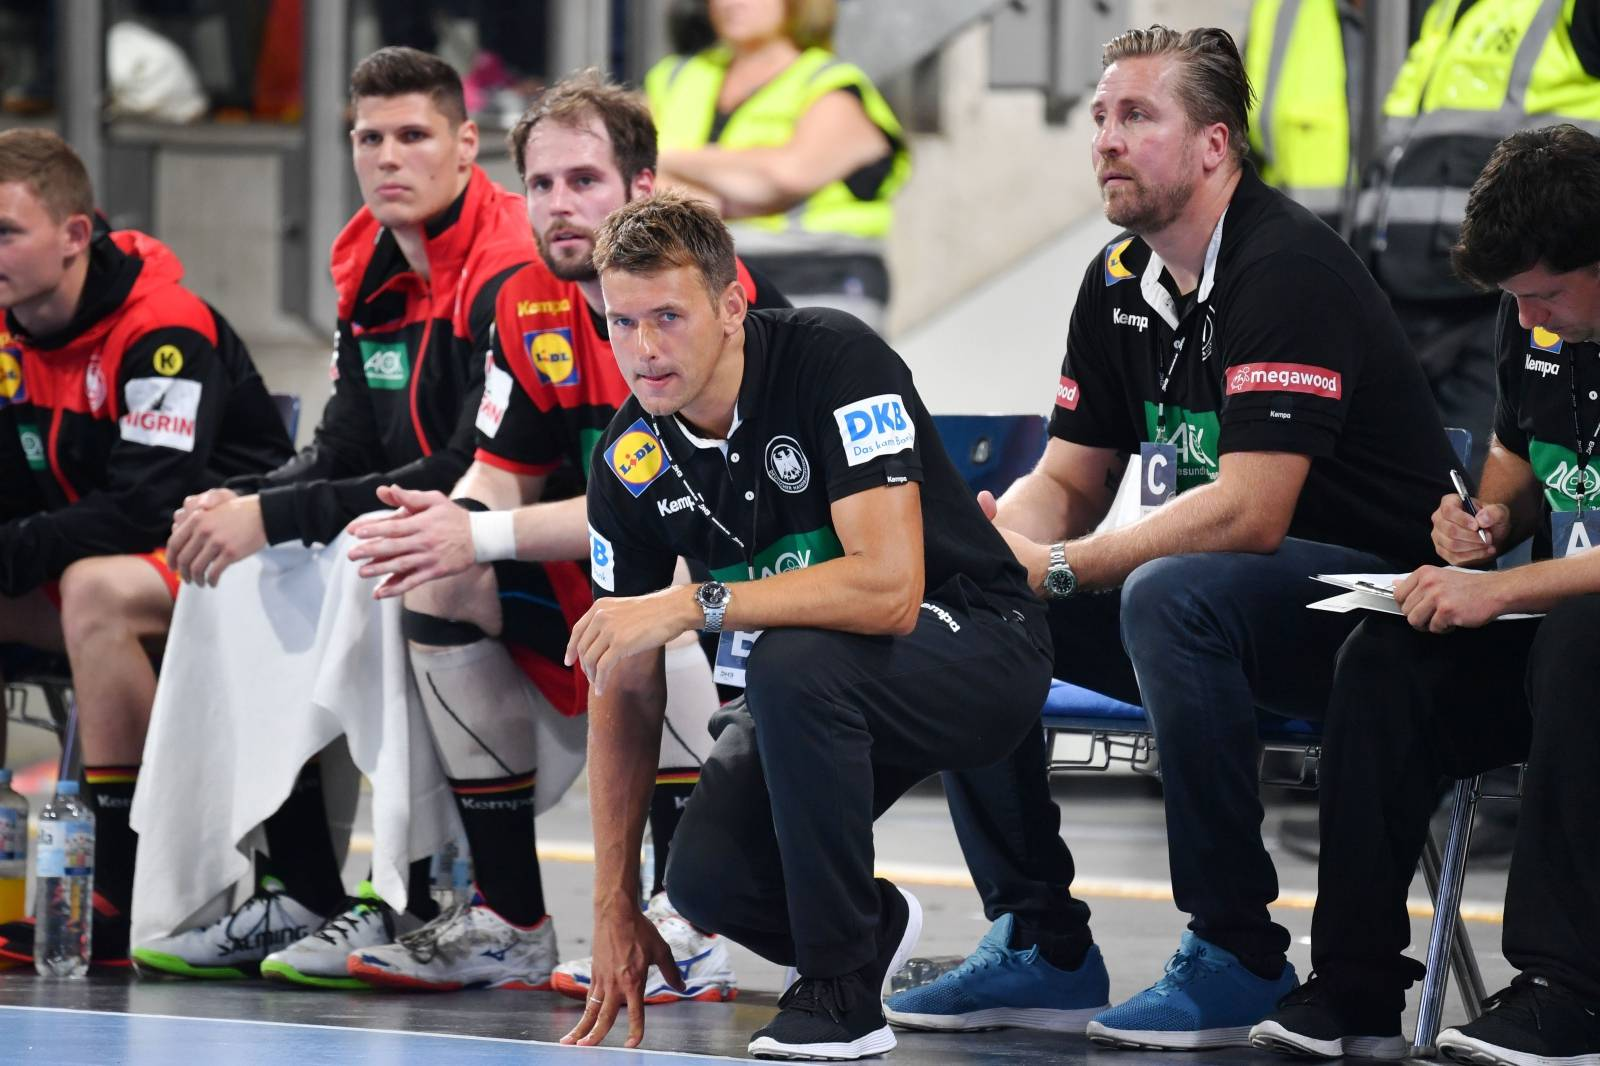 Handball Laenderspiel / Germany-Kosovo 28-17.